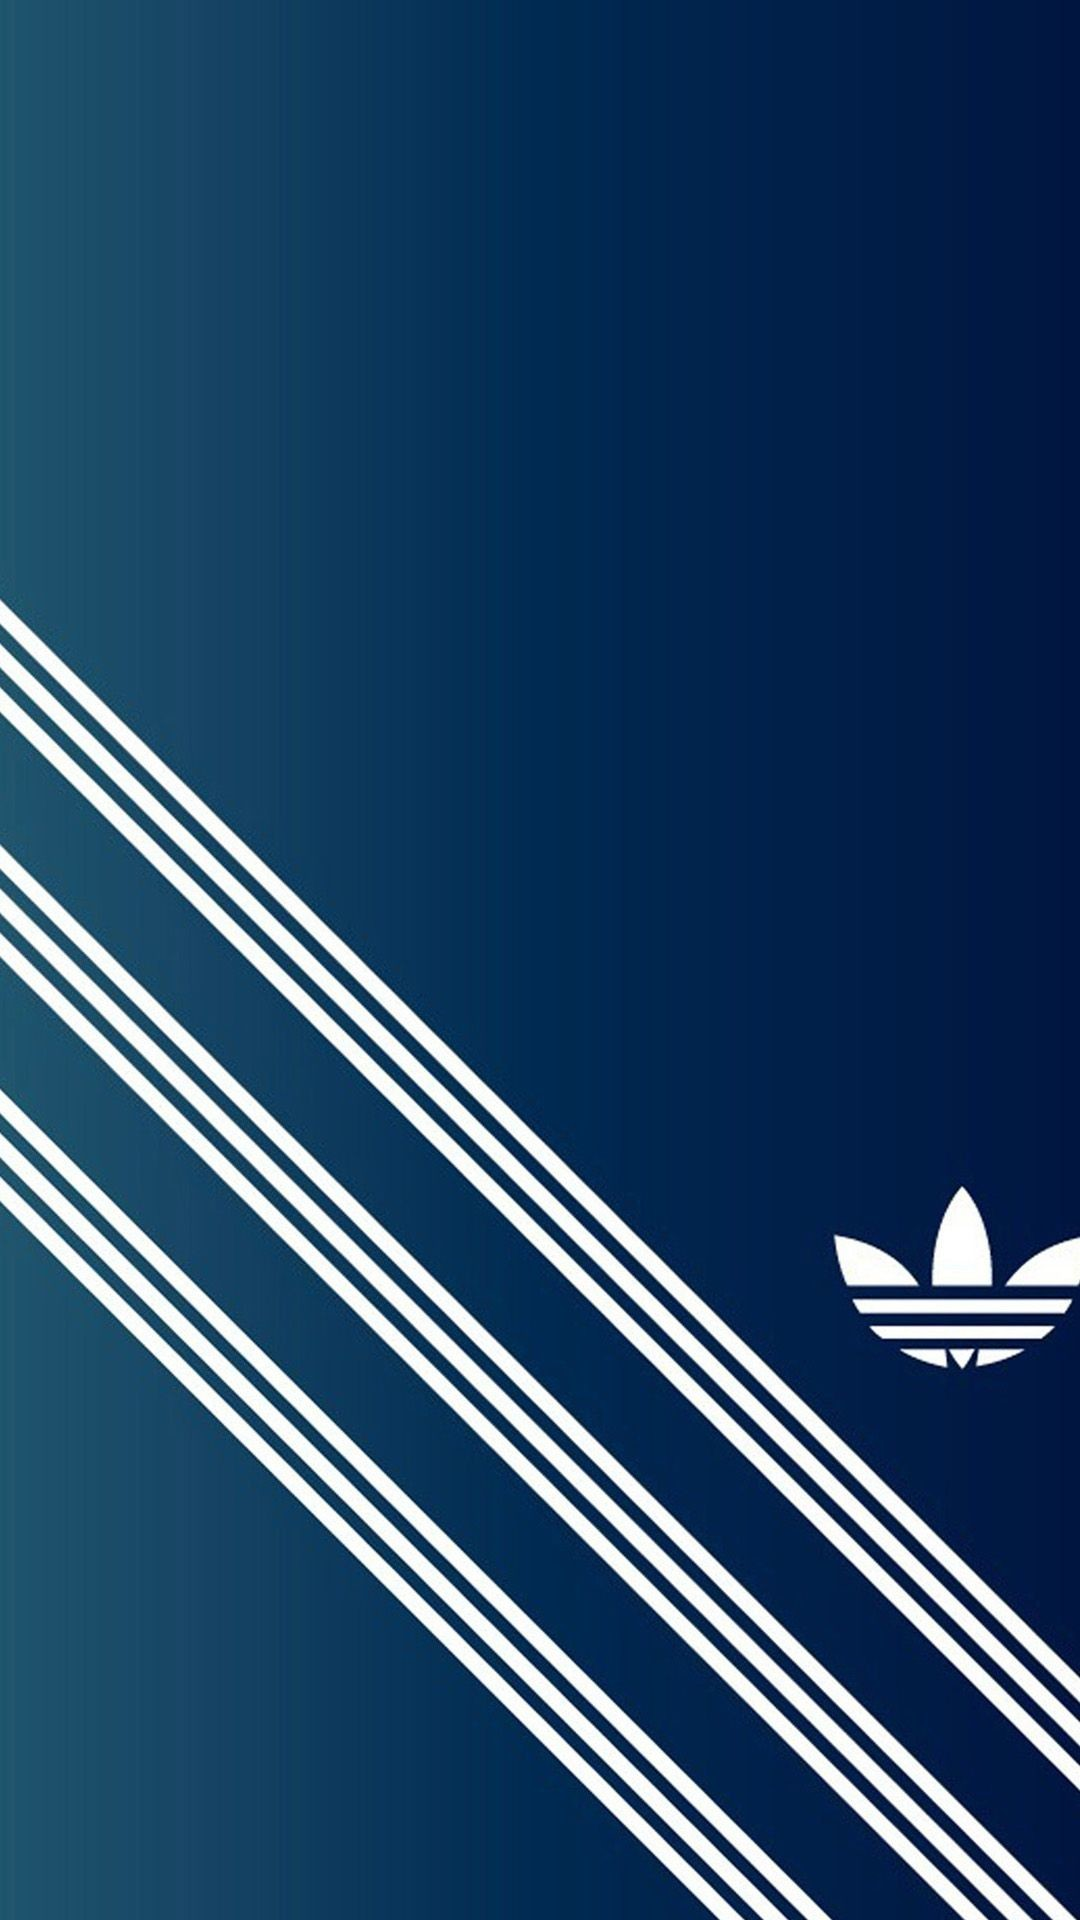 Adidas Htc One M8 Wallpaper Data-src /w/full/8/c/5/533443 ...